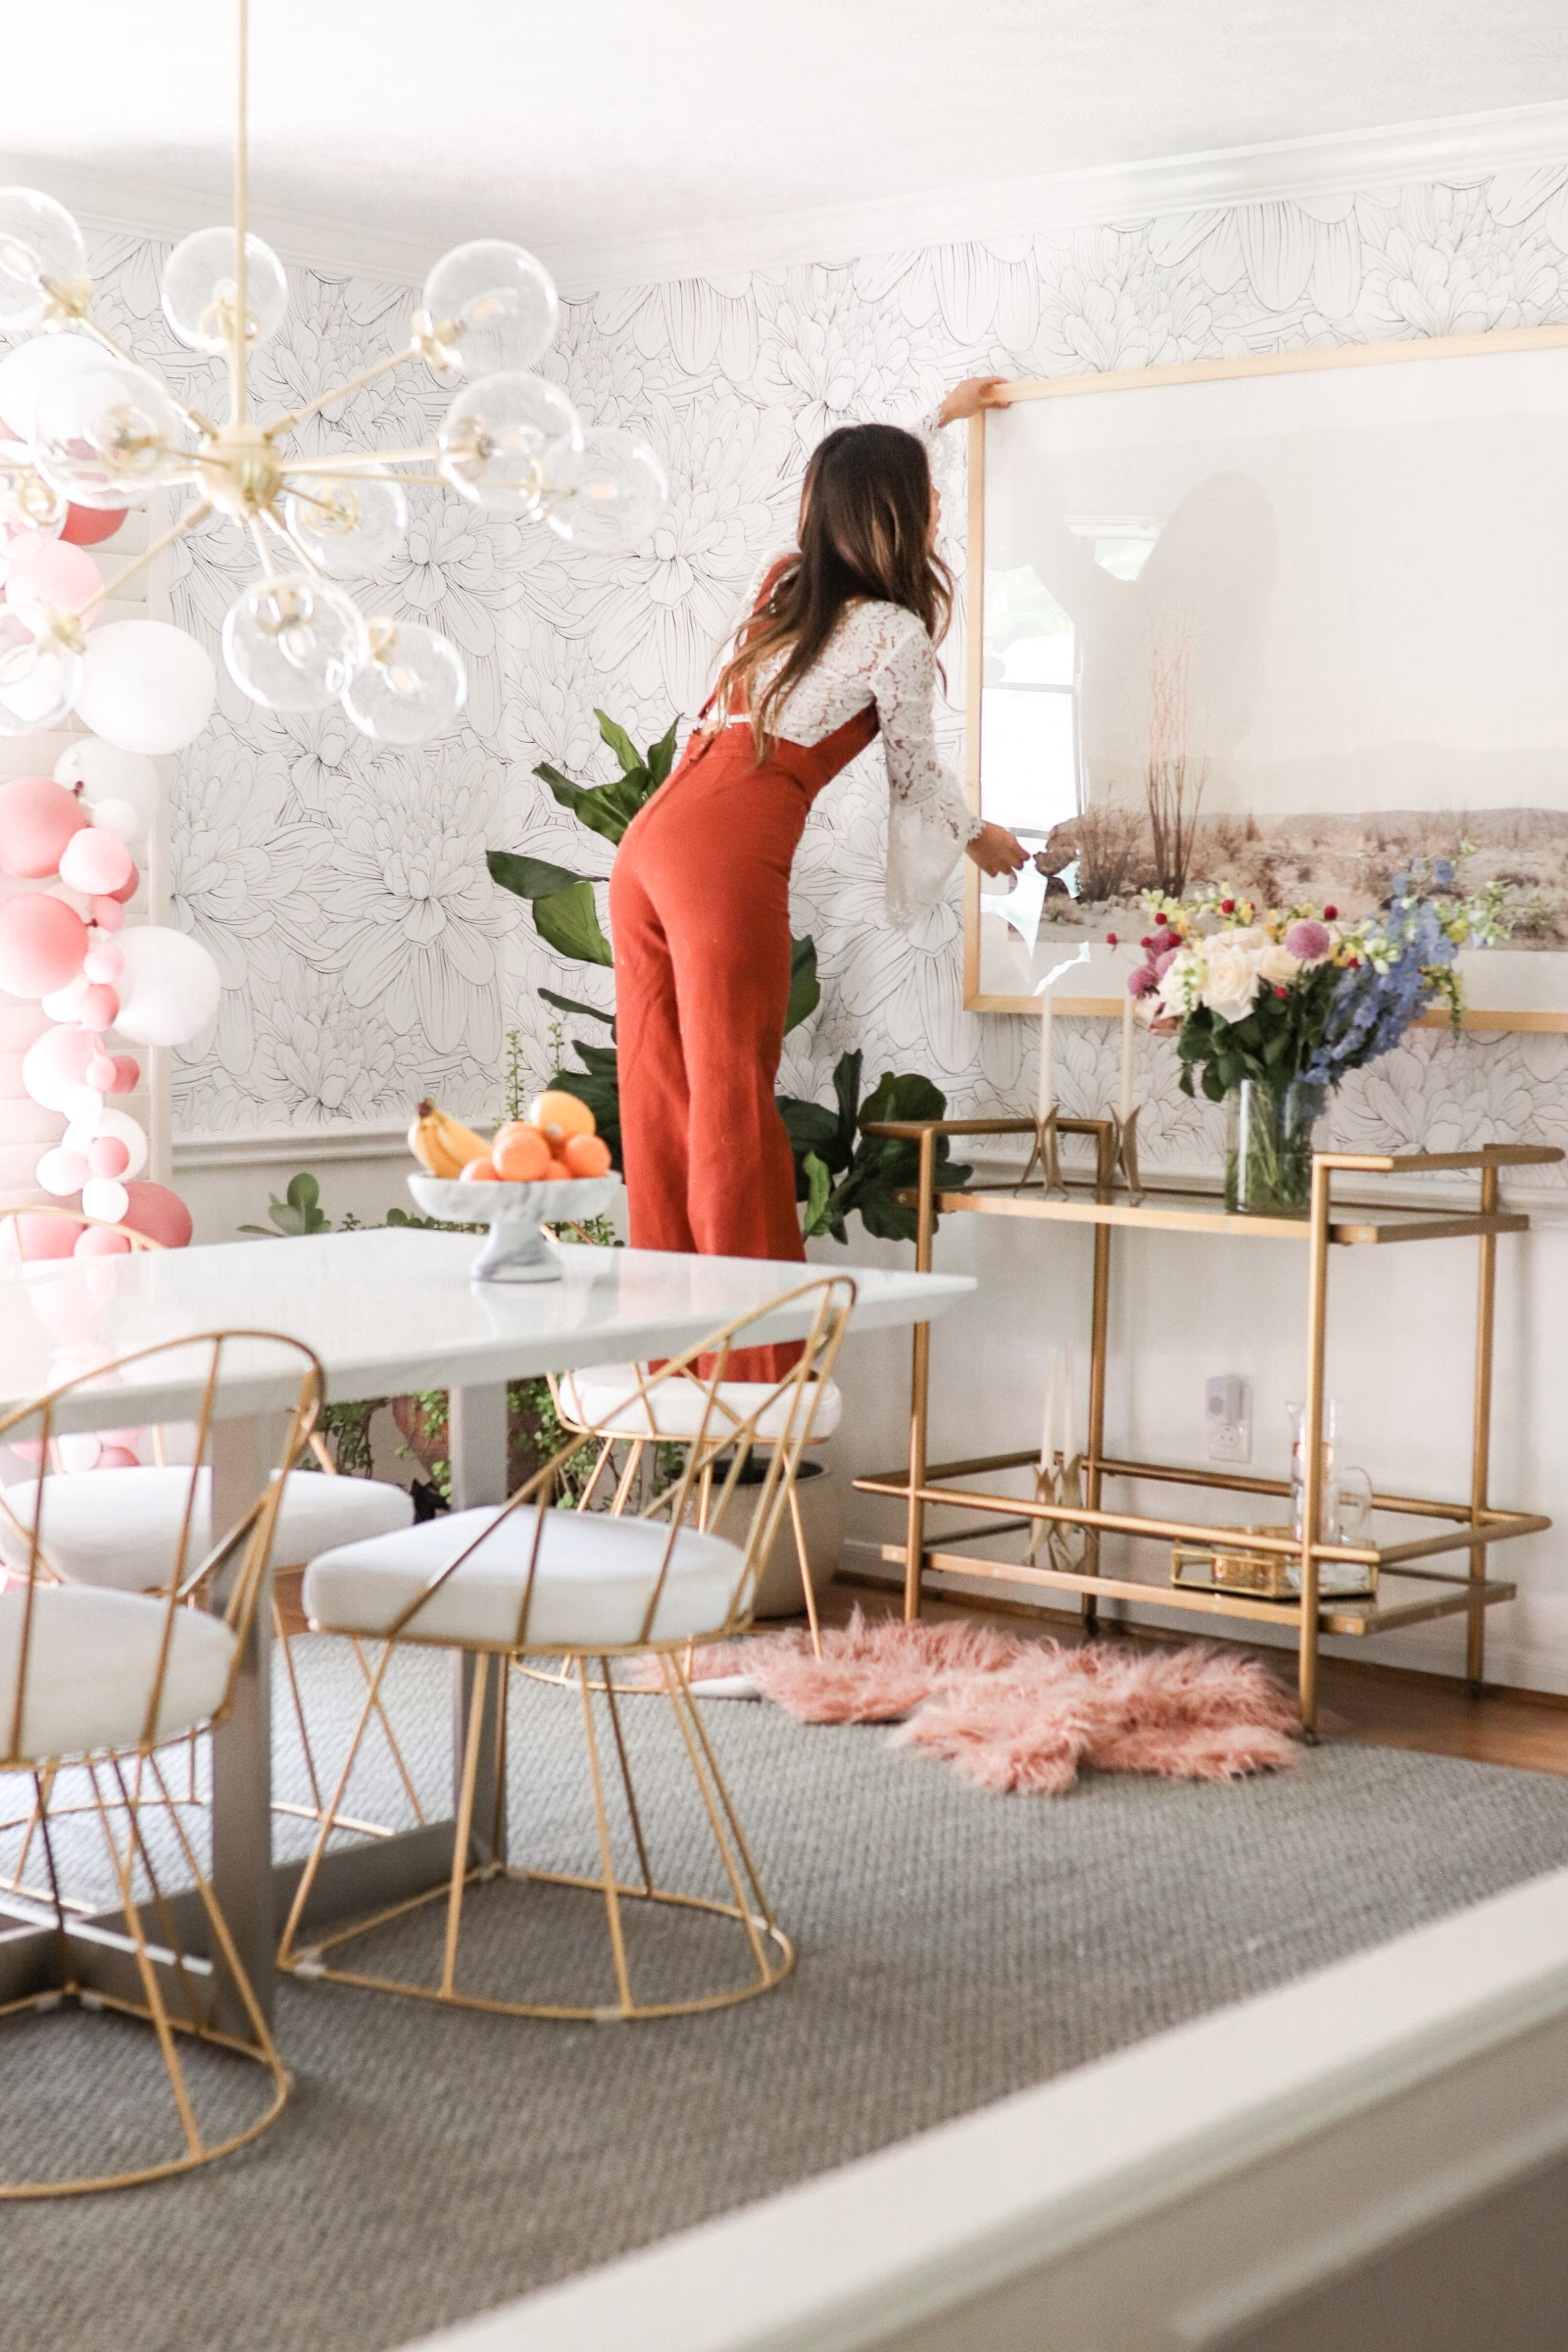 Home decor blogger Joyfullygreen wallpaper dining room makeover how to choose art with minted -09.jpg